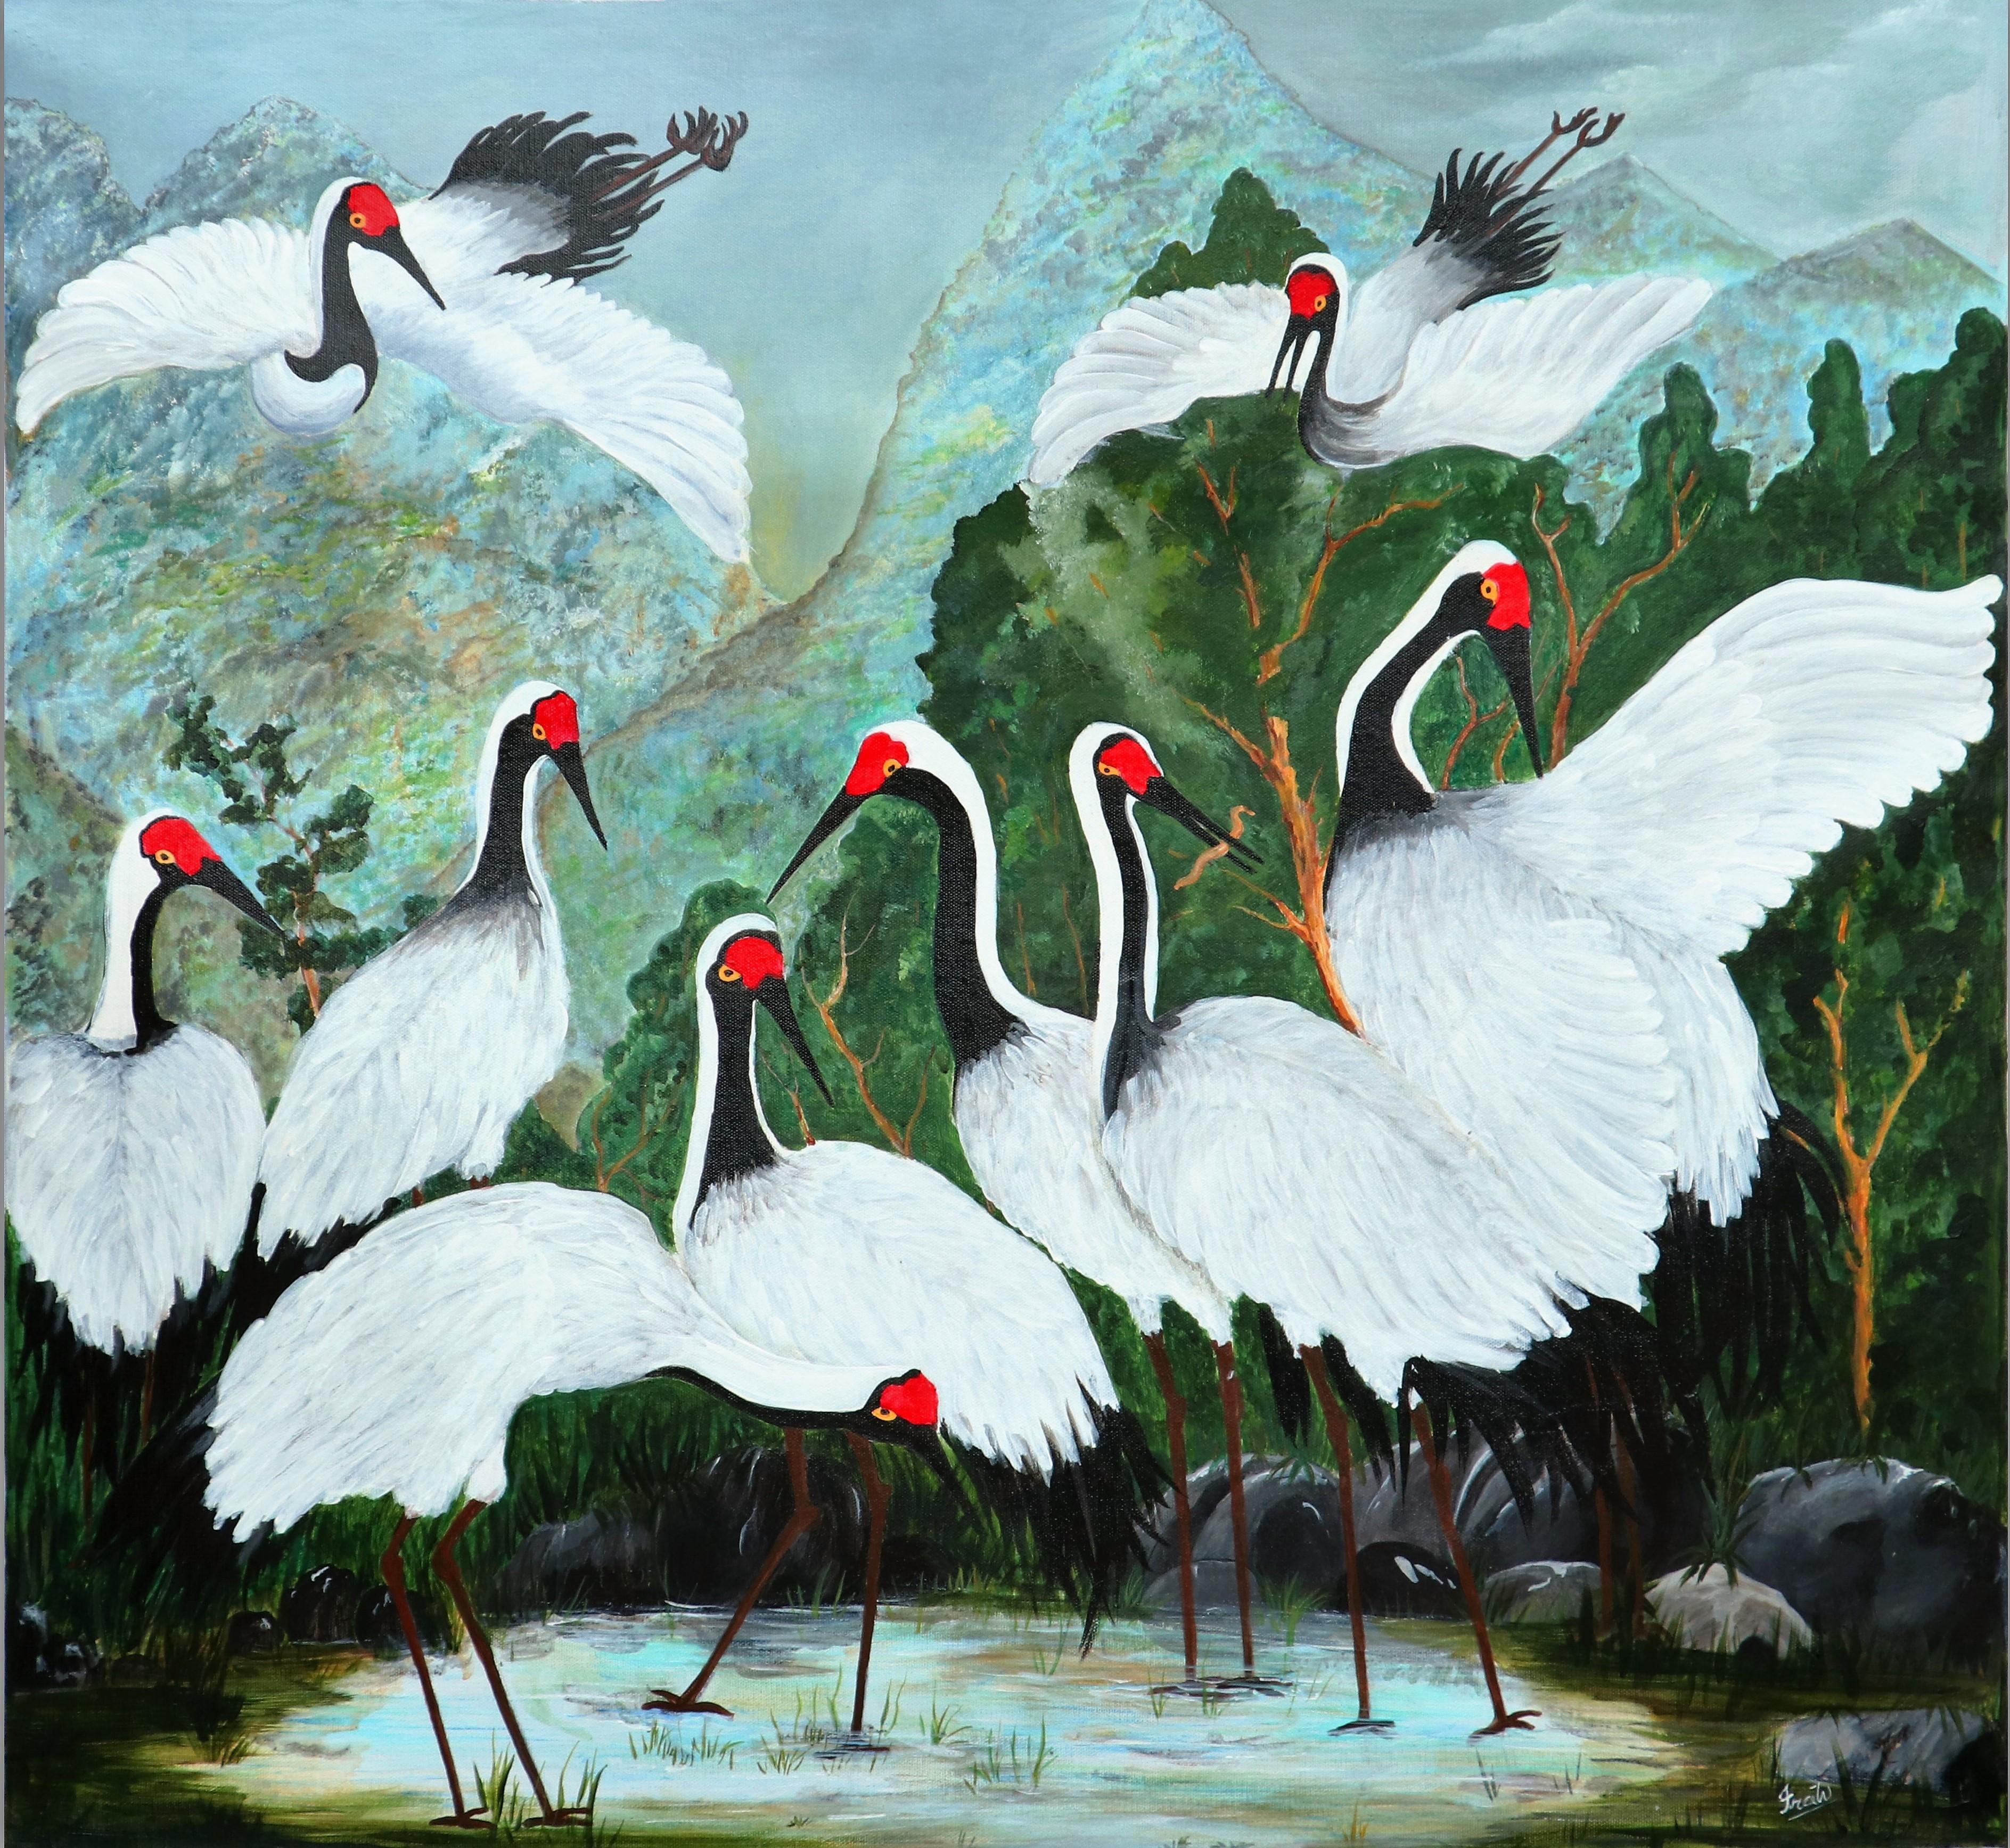 Storks by Iranganie Wickramasinghe